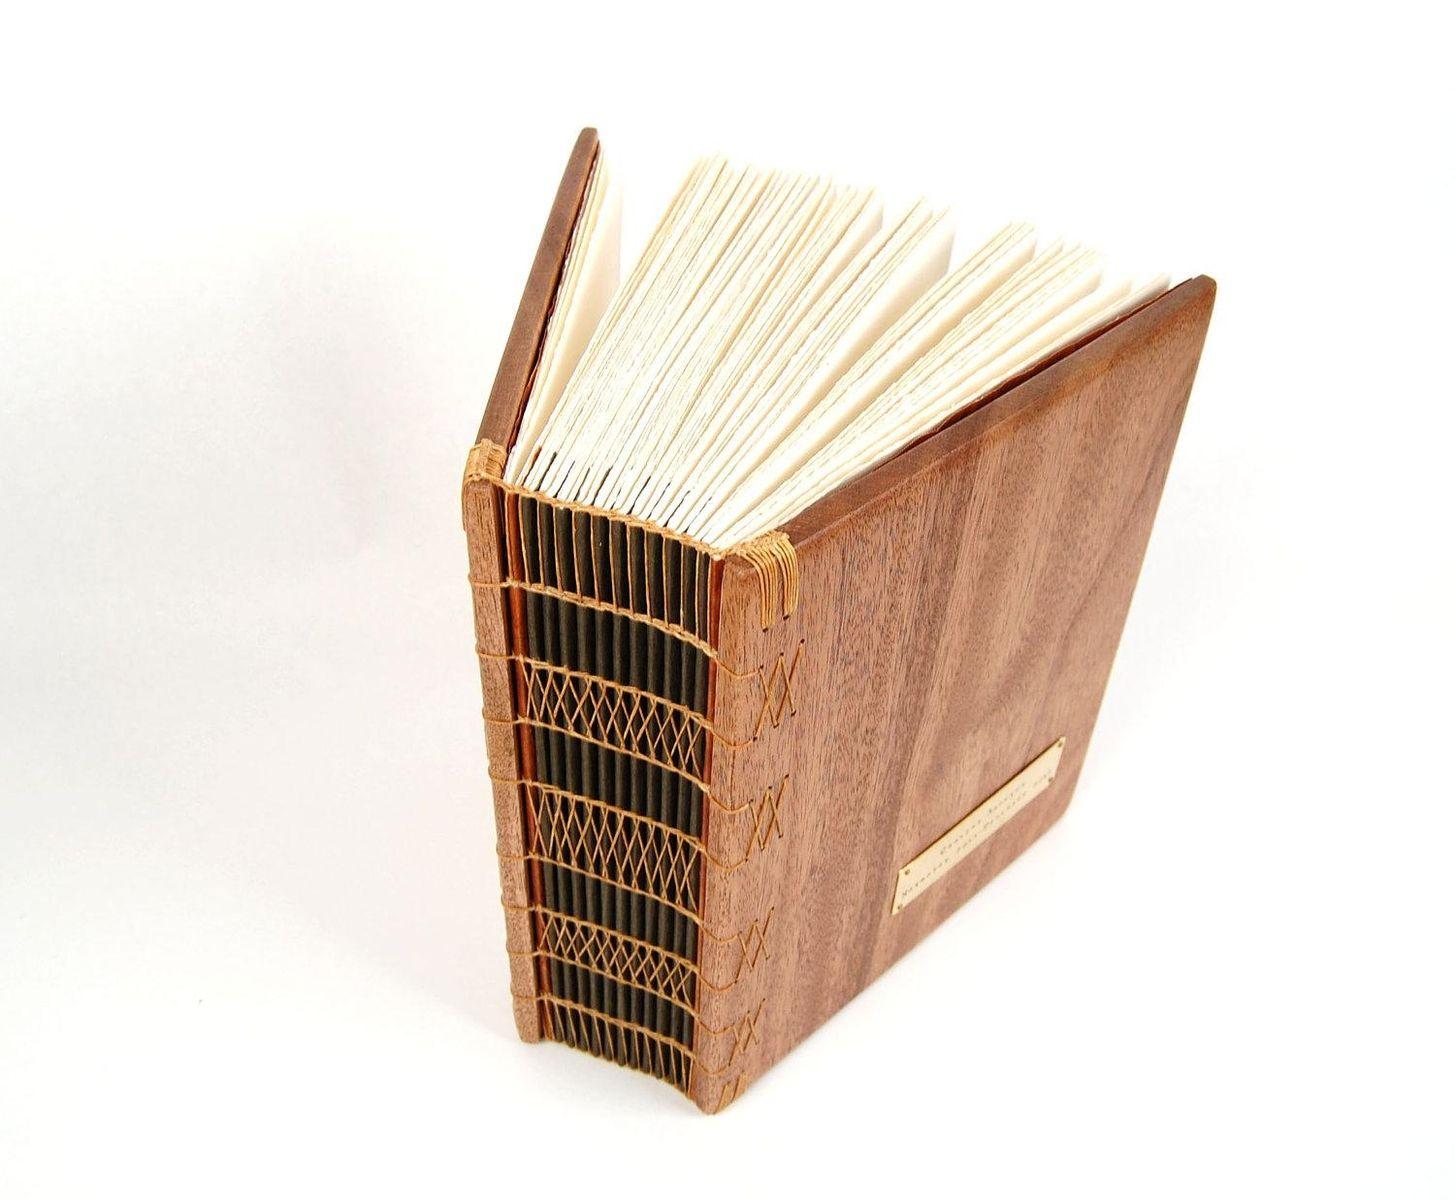 Hand Crafted Large Mahogany Photo Album Scrapbook Handmade Wood Book Heirloom Memory Book Anniversary Gift By Three Trees Bindery Custommade Com